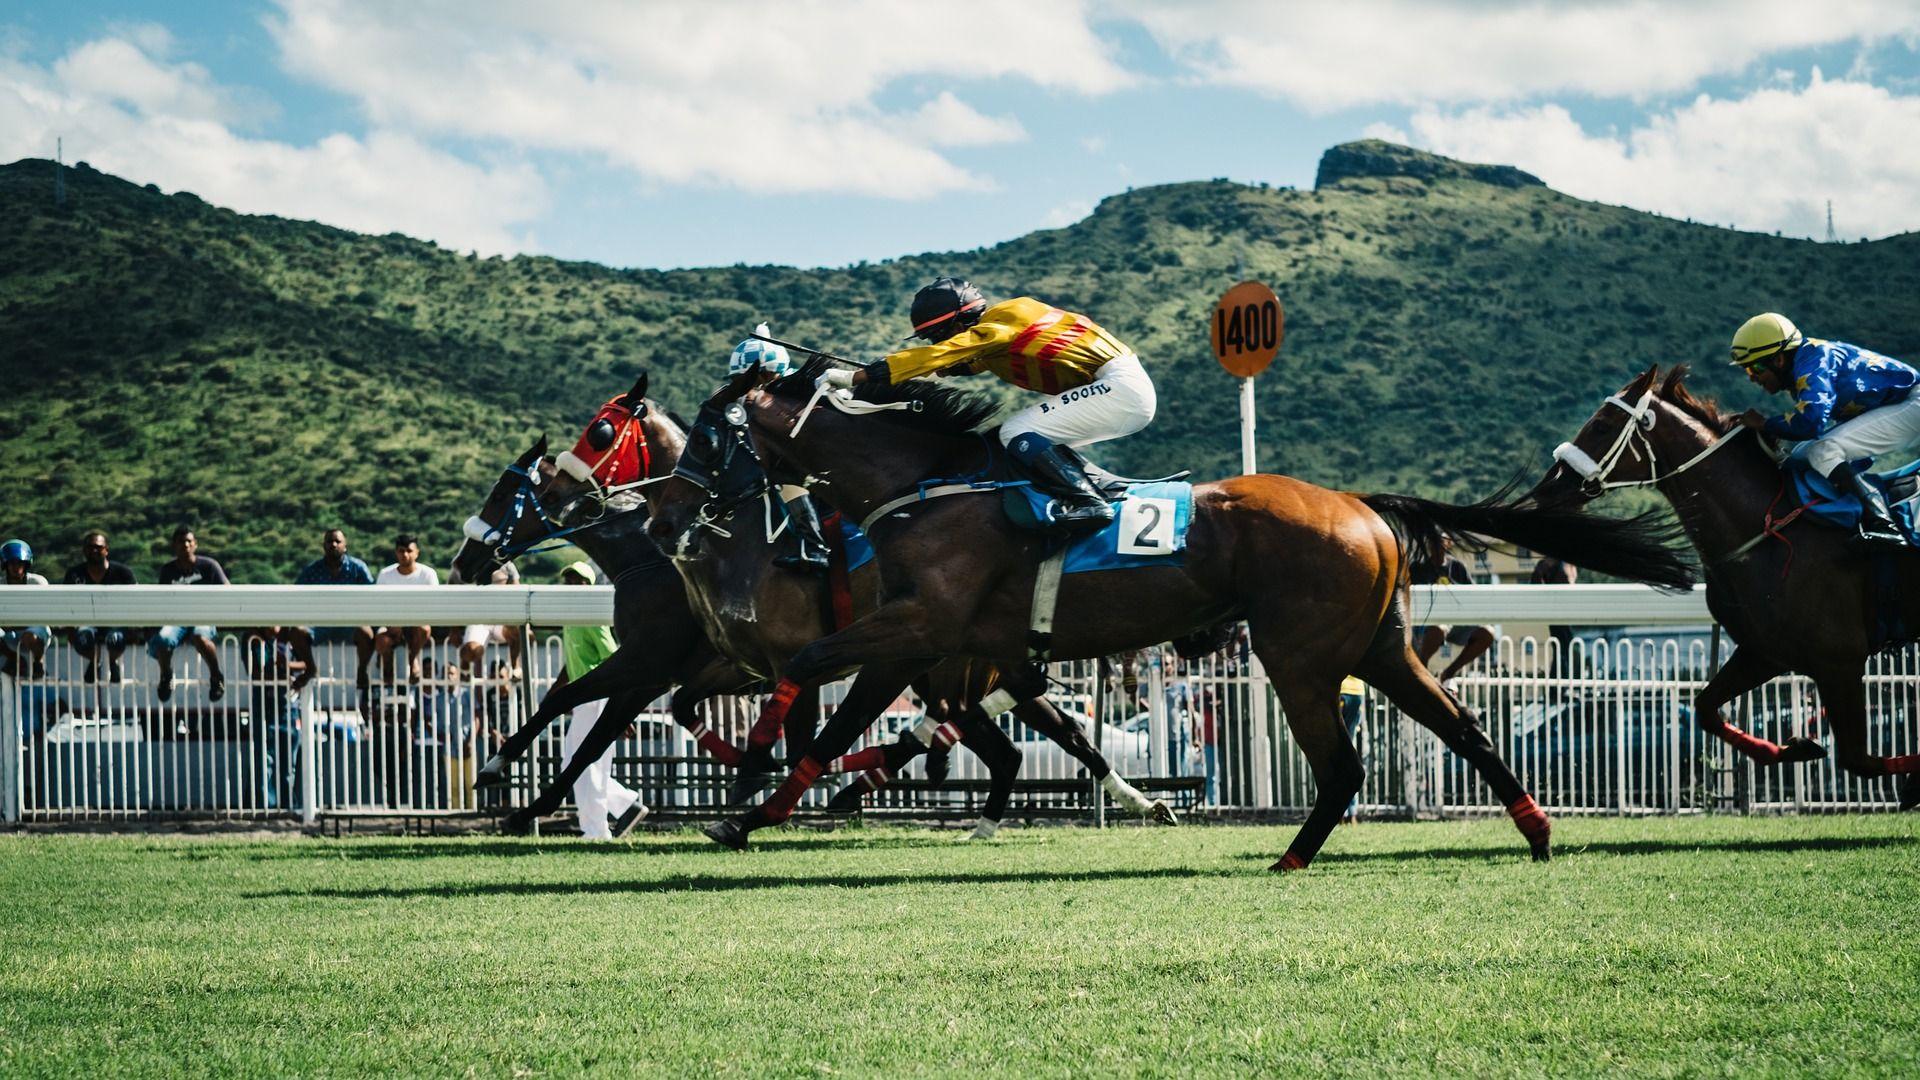 Equestrian Free Desktop Wallpaper